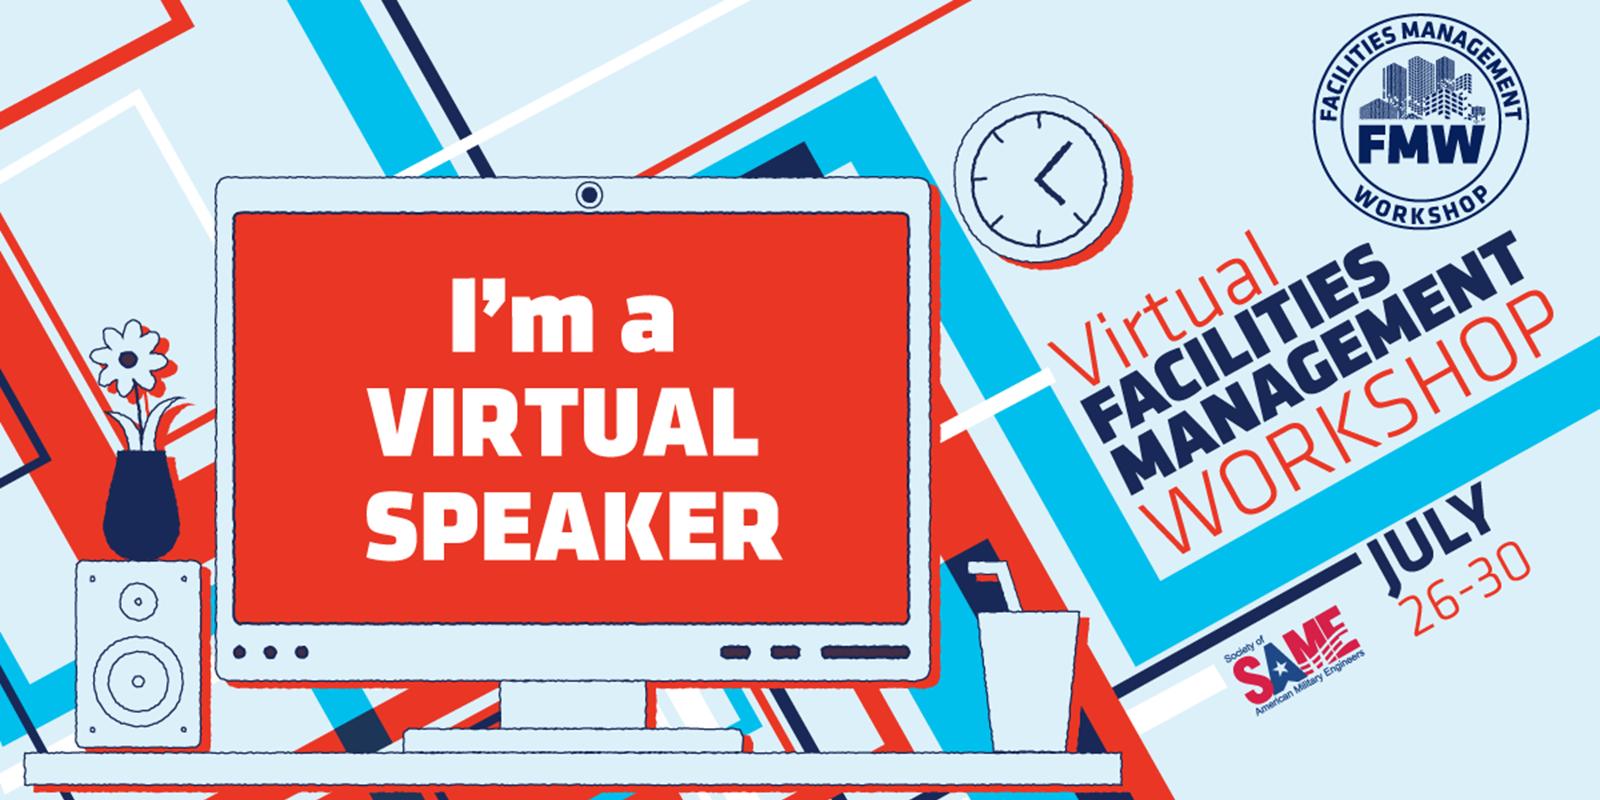 VFMW Speaker Graphic